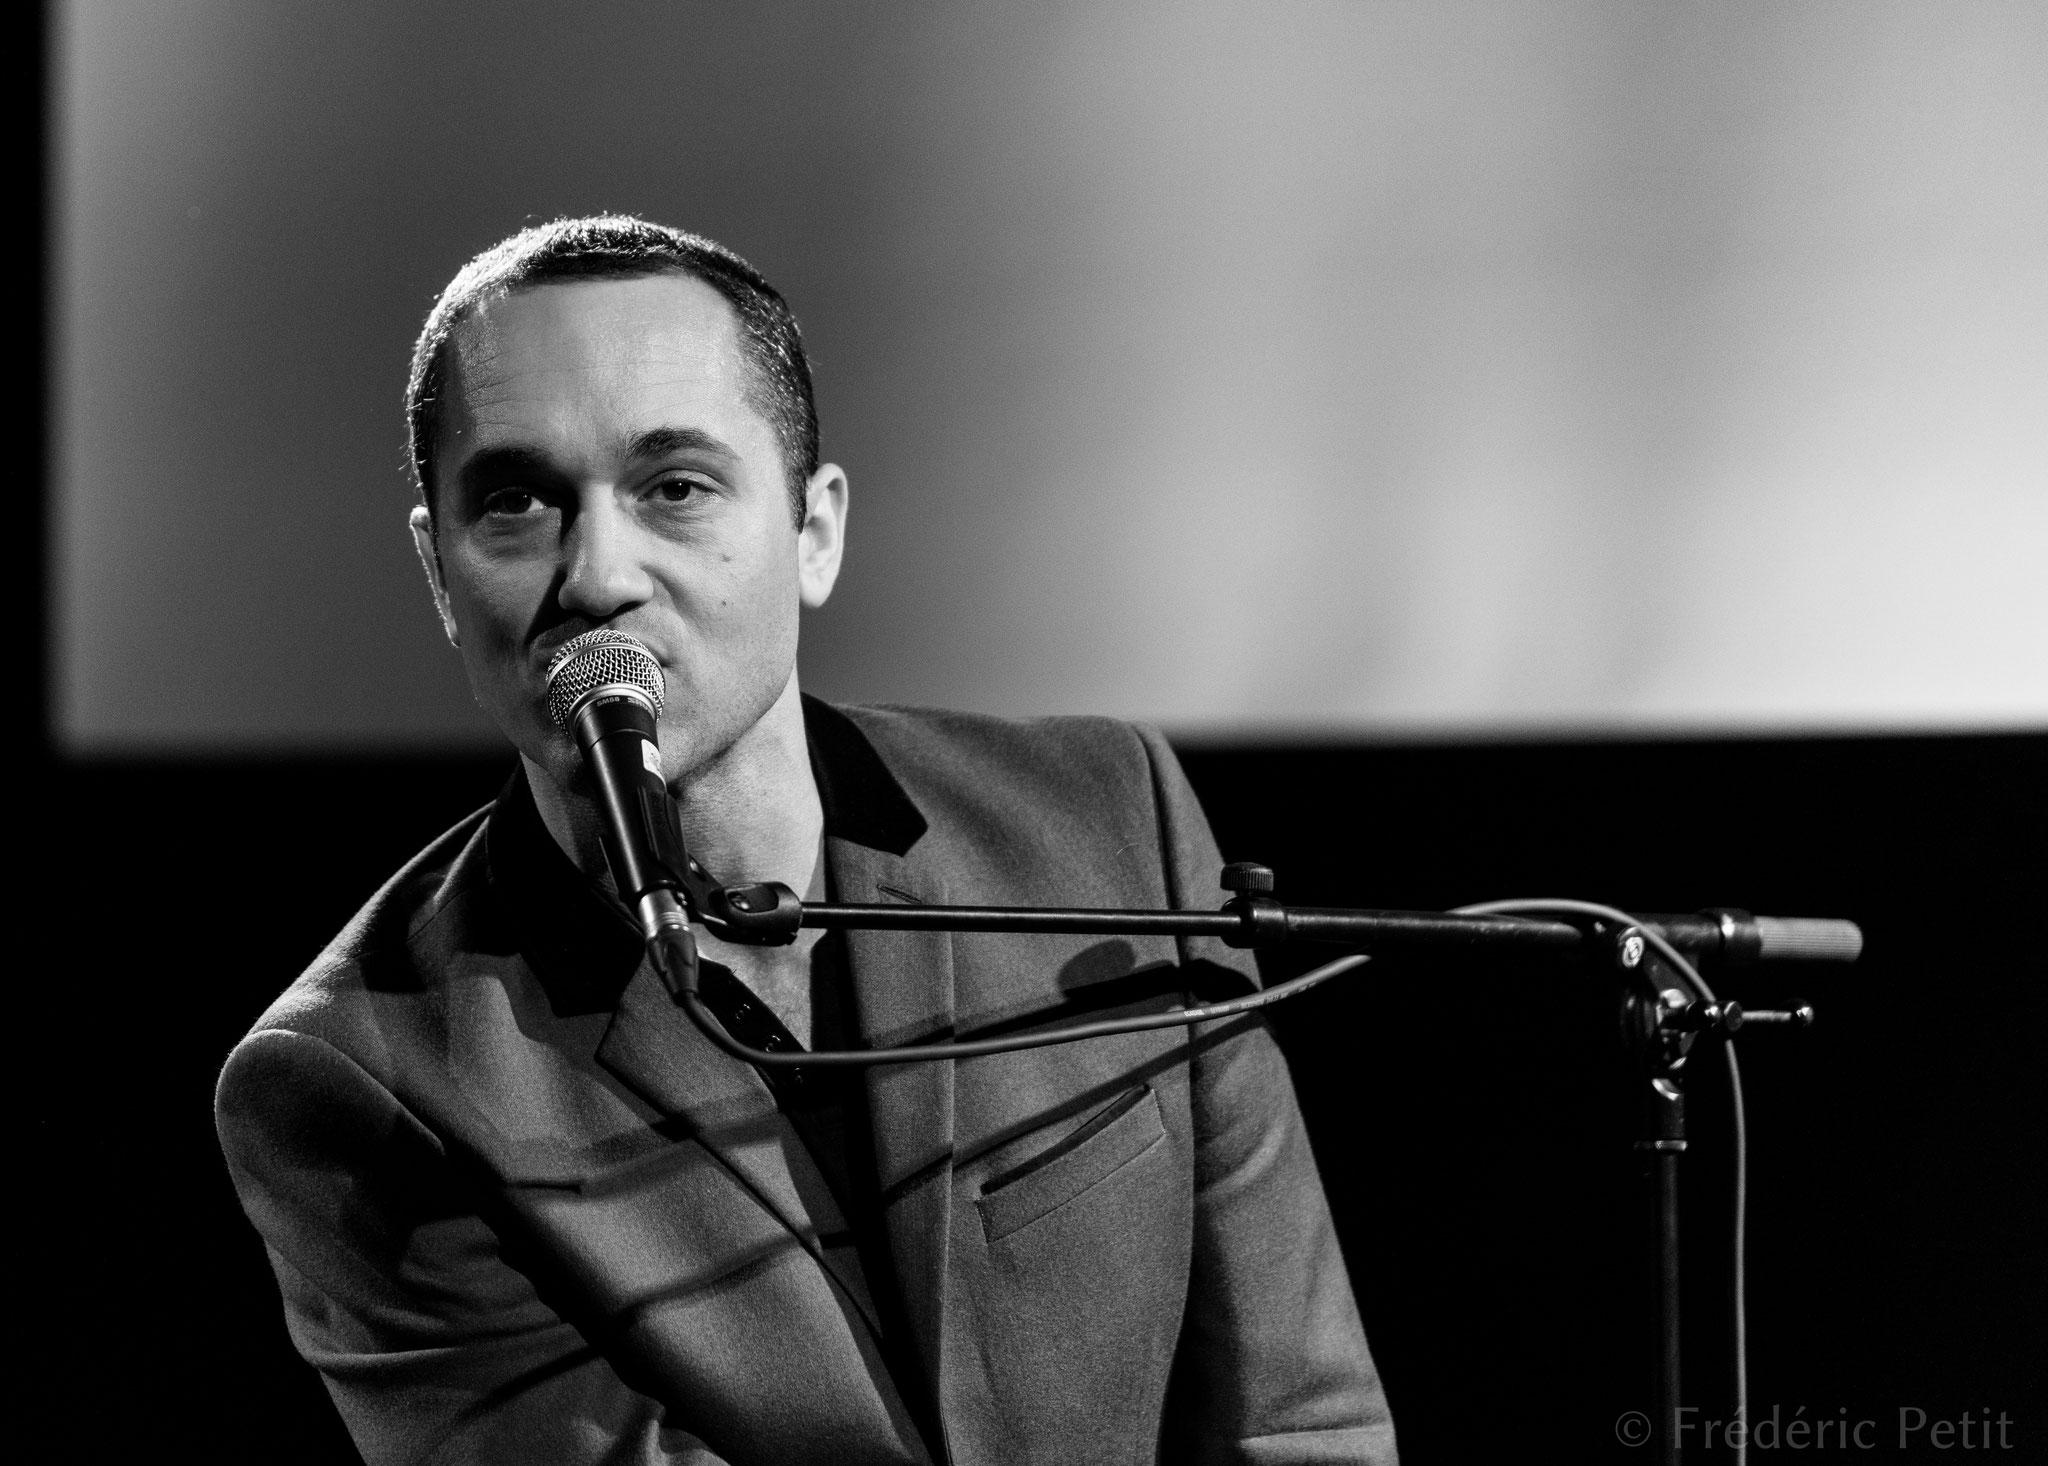 16 février 2017 - Nicolas Séguy @ Centre Malesherbes (Prix Moustaki)